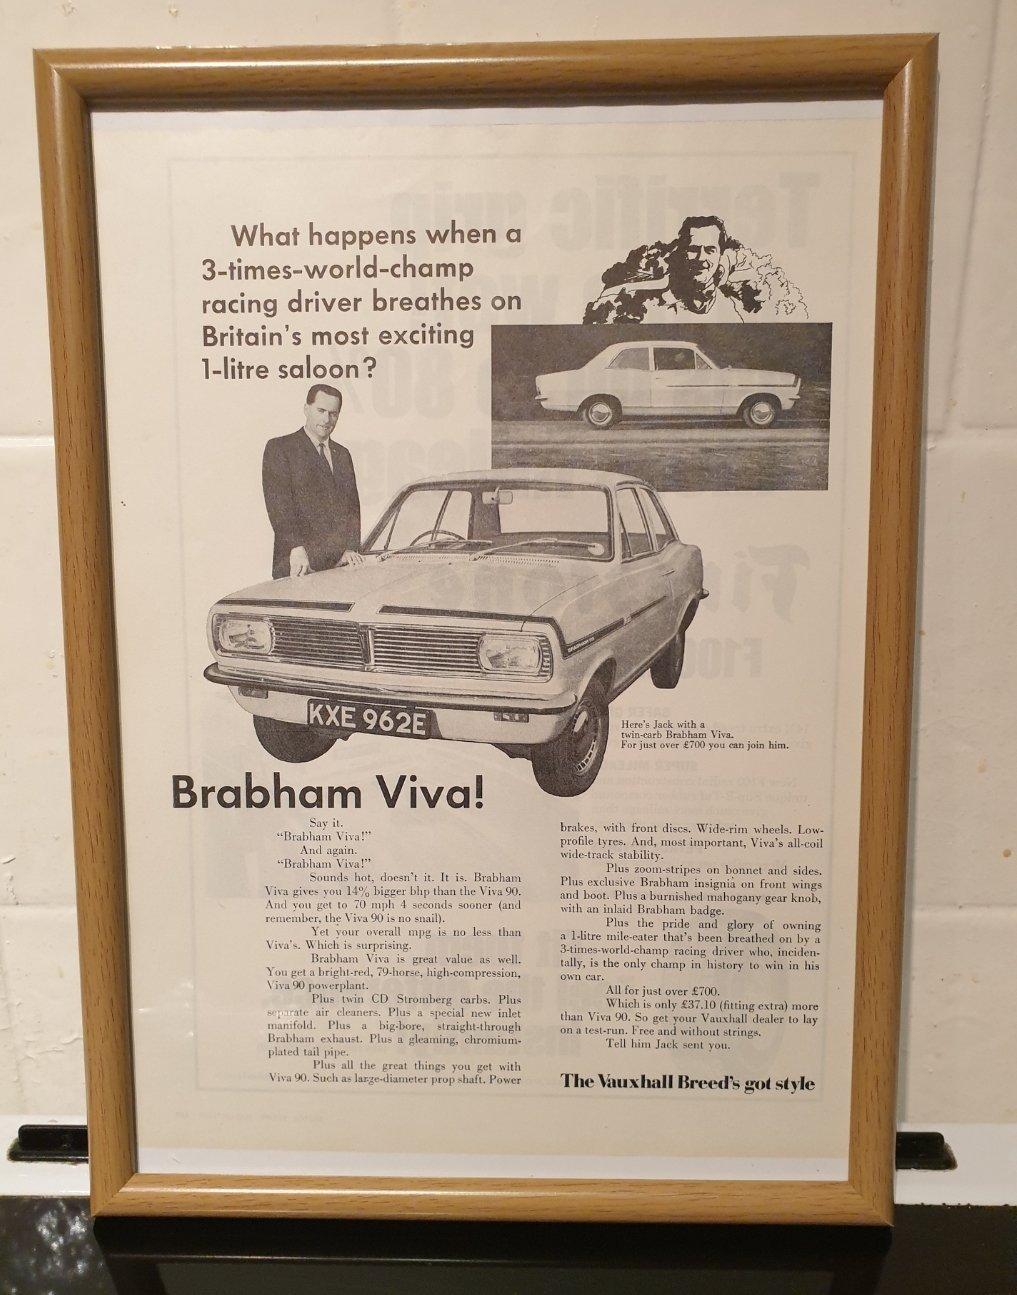 1967 Vauxhall Brabham Viva Advert Original  For Sale (picture 1 of 2)